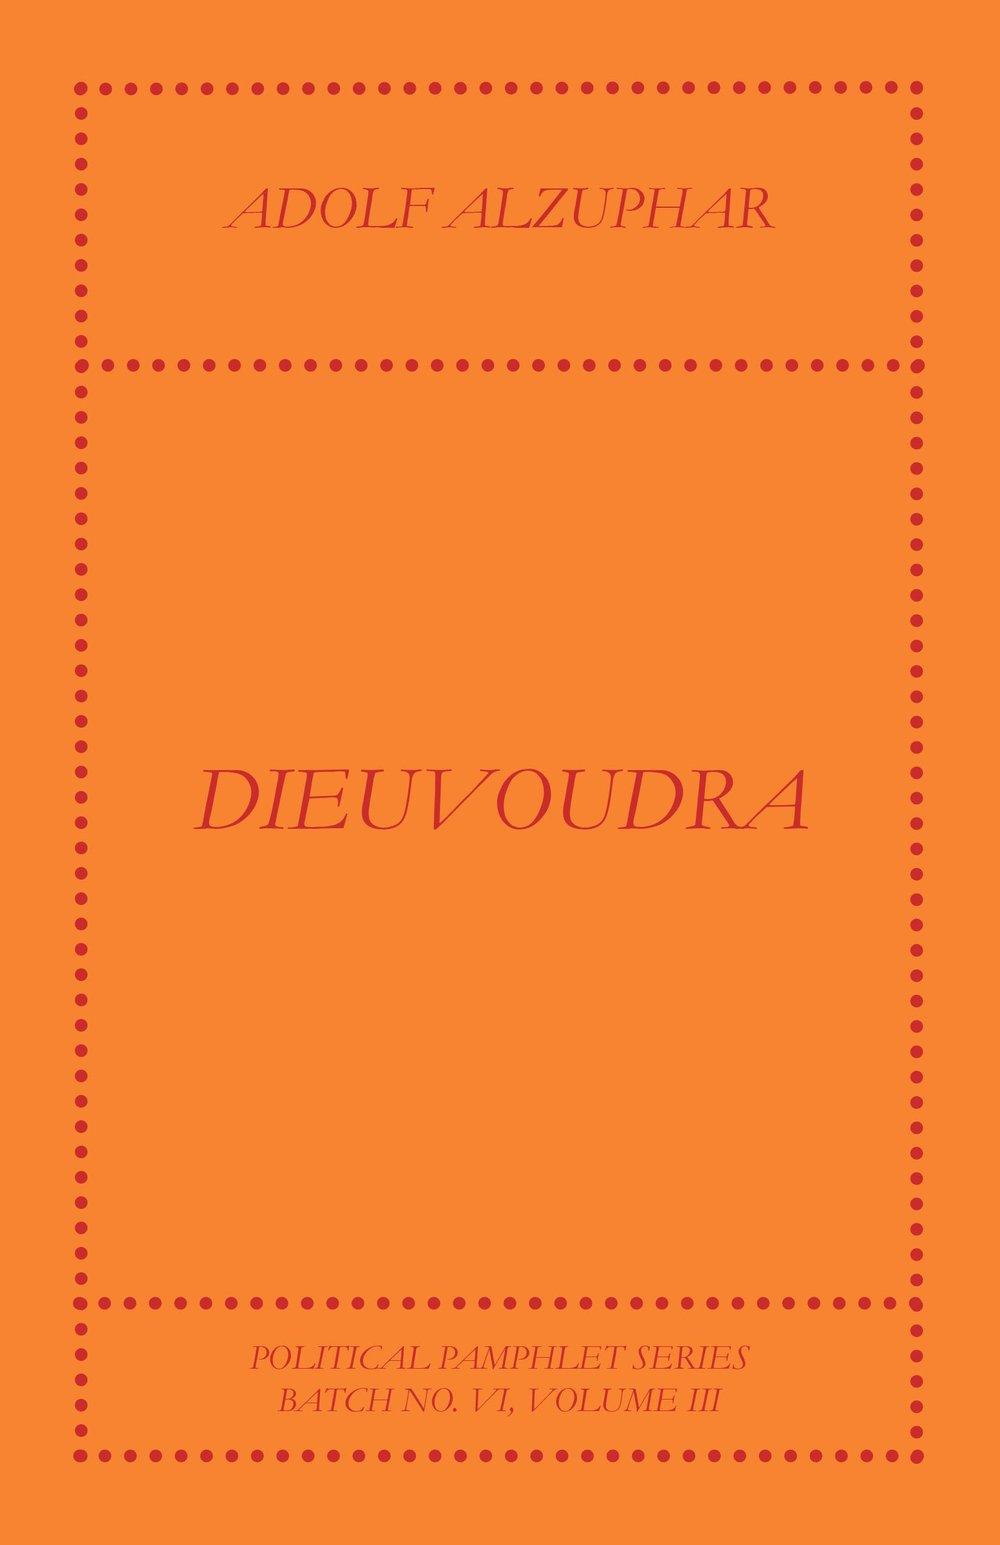 ADOLF.pdf-1.jpg